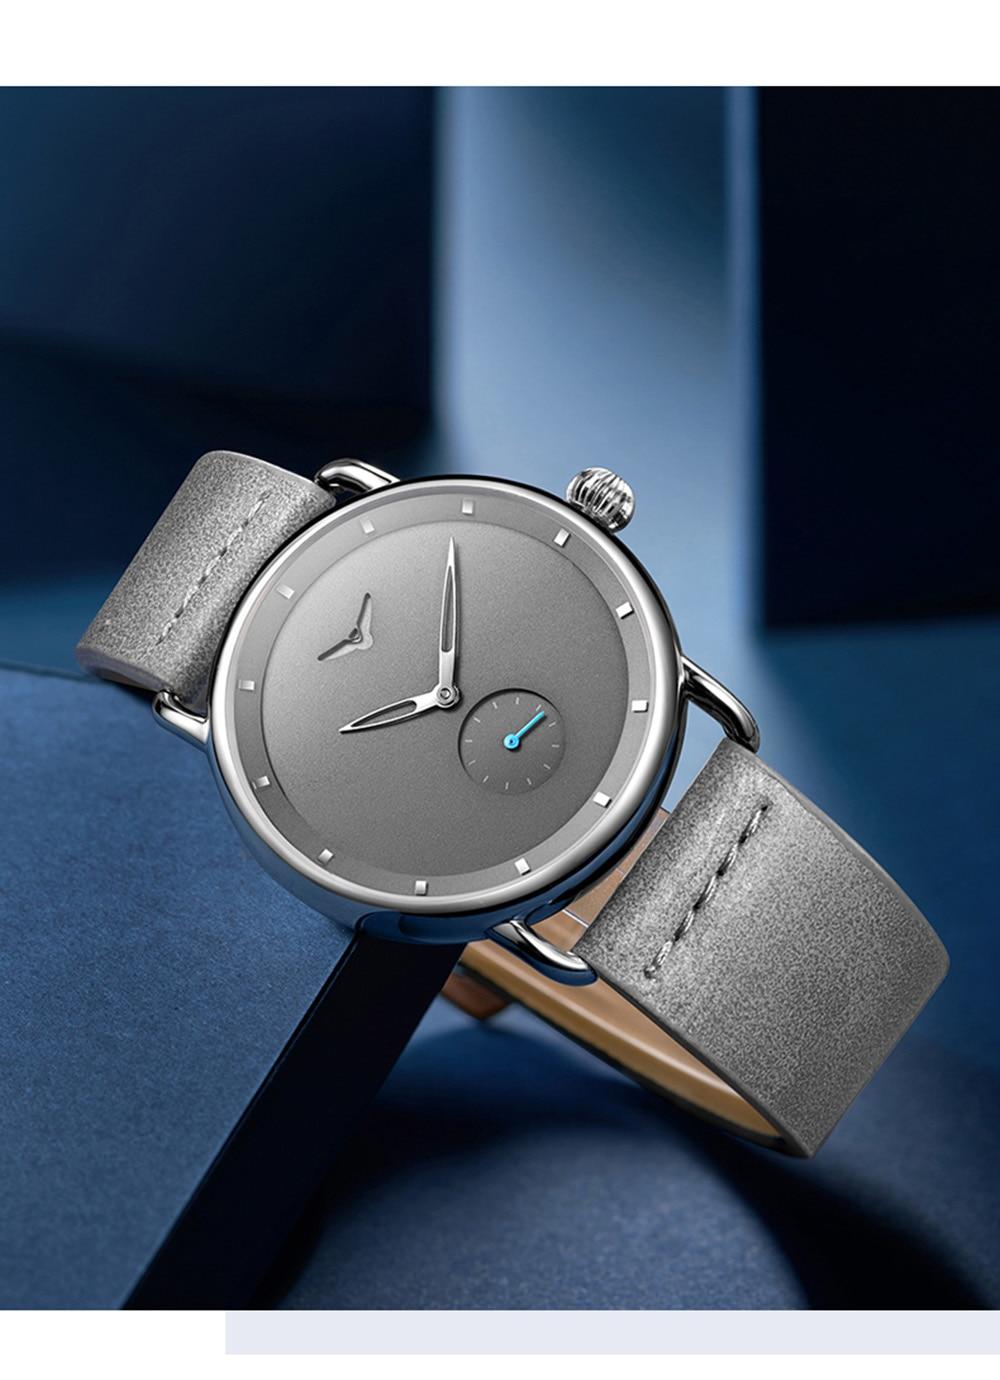 H94ac5d430b5744e2a4b7b5413fd855dde ONOLA top brand leather men watches clock fashion sport simple casual waterproof Wrist watch men relogio masculino